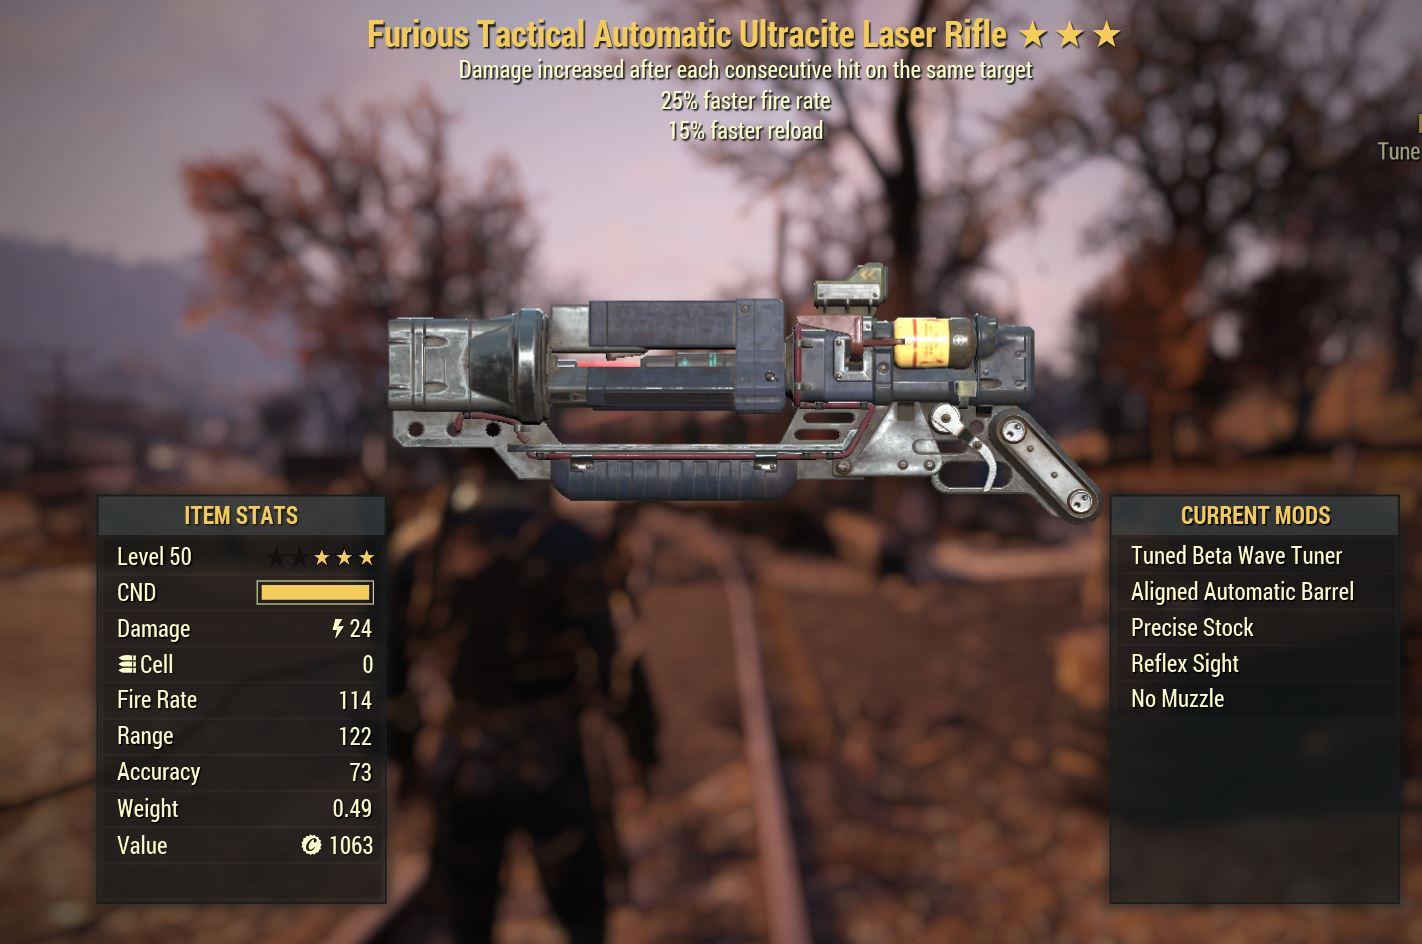 Laser Rifle F2515r